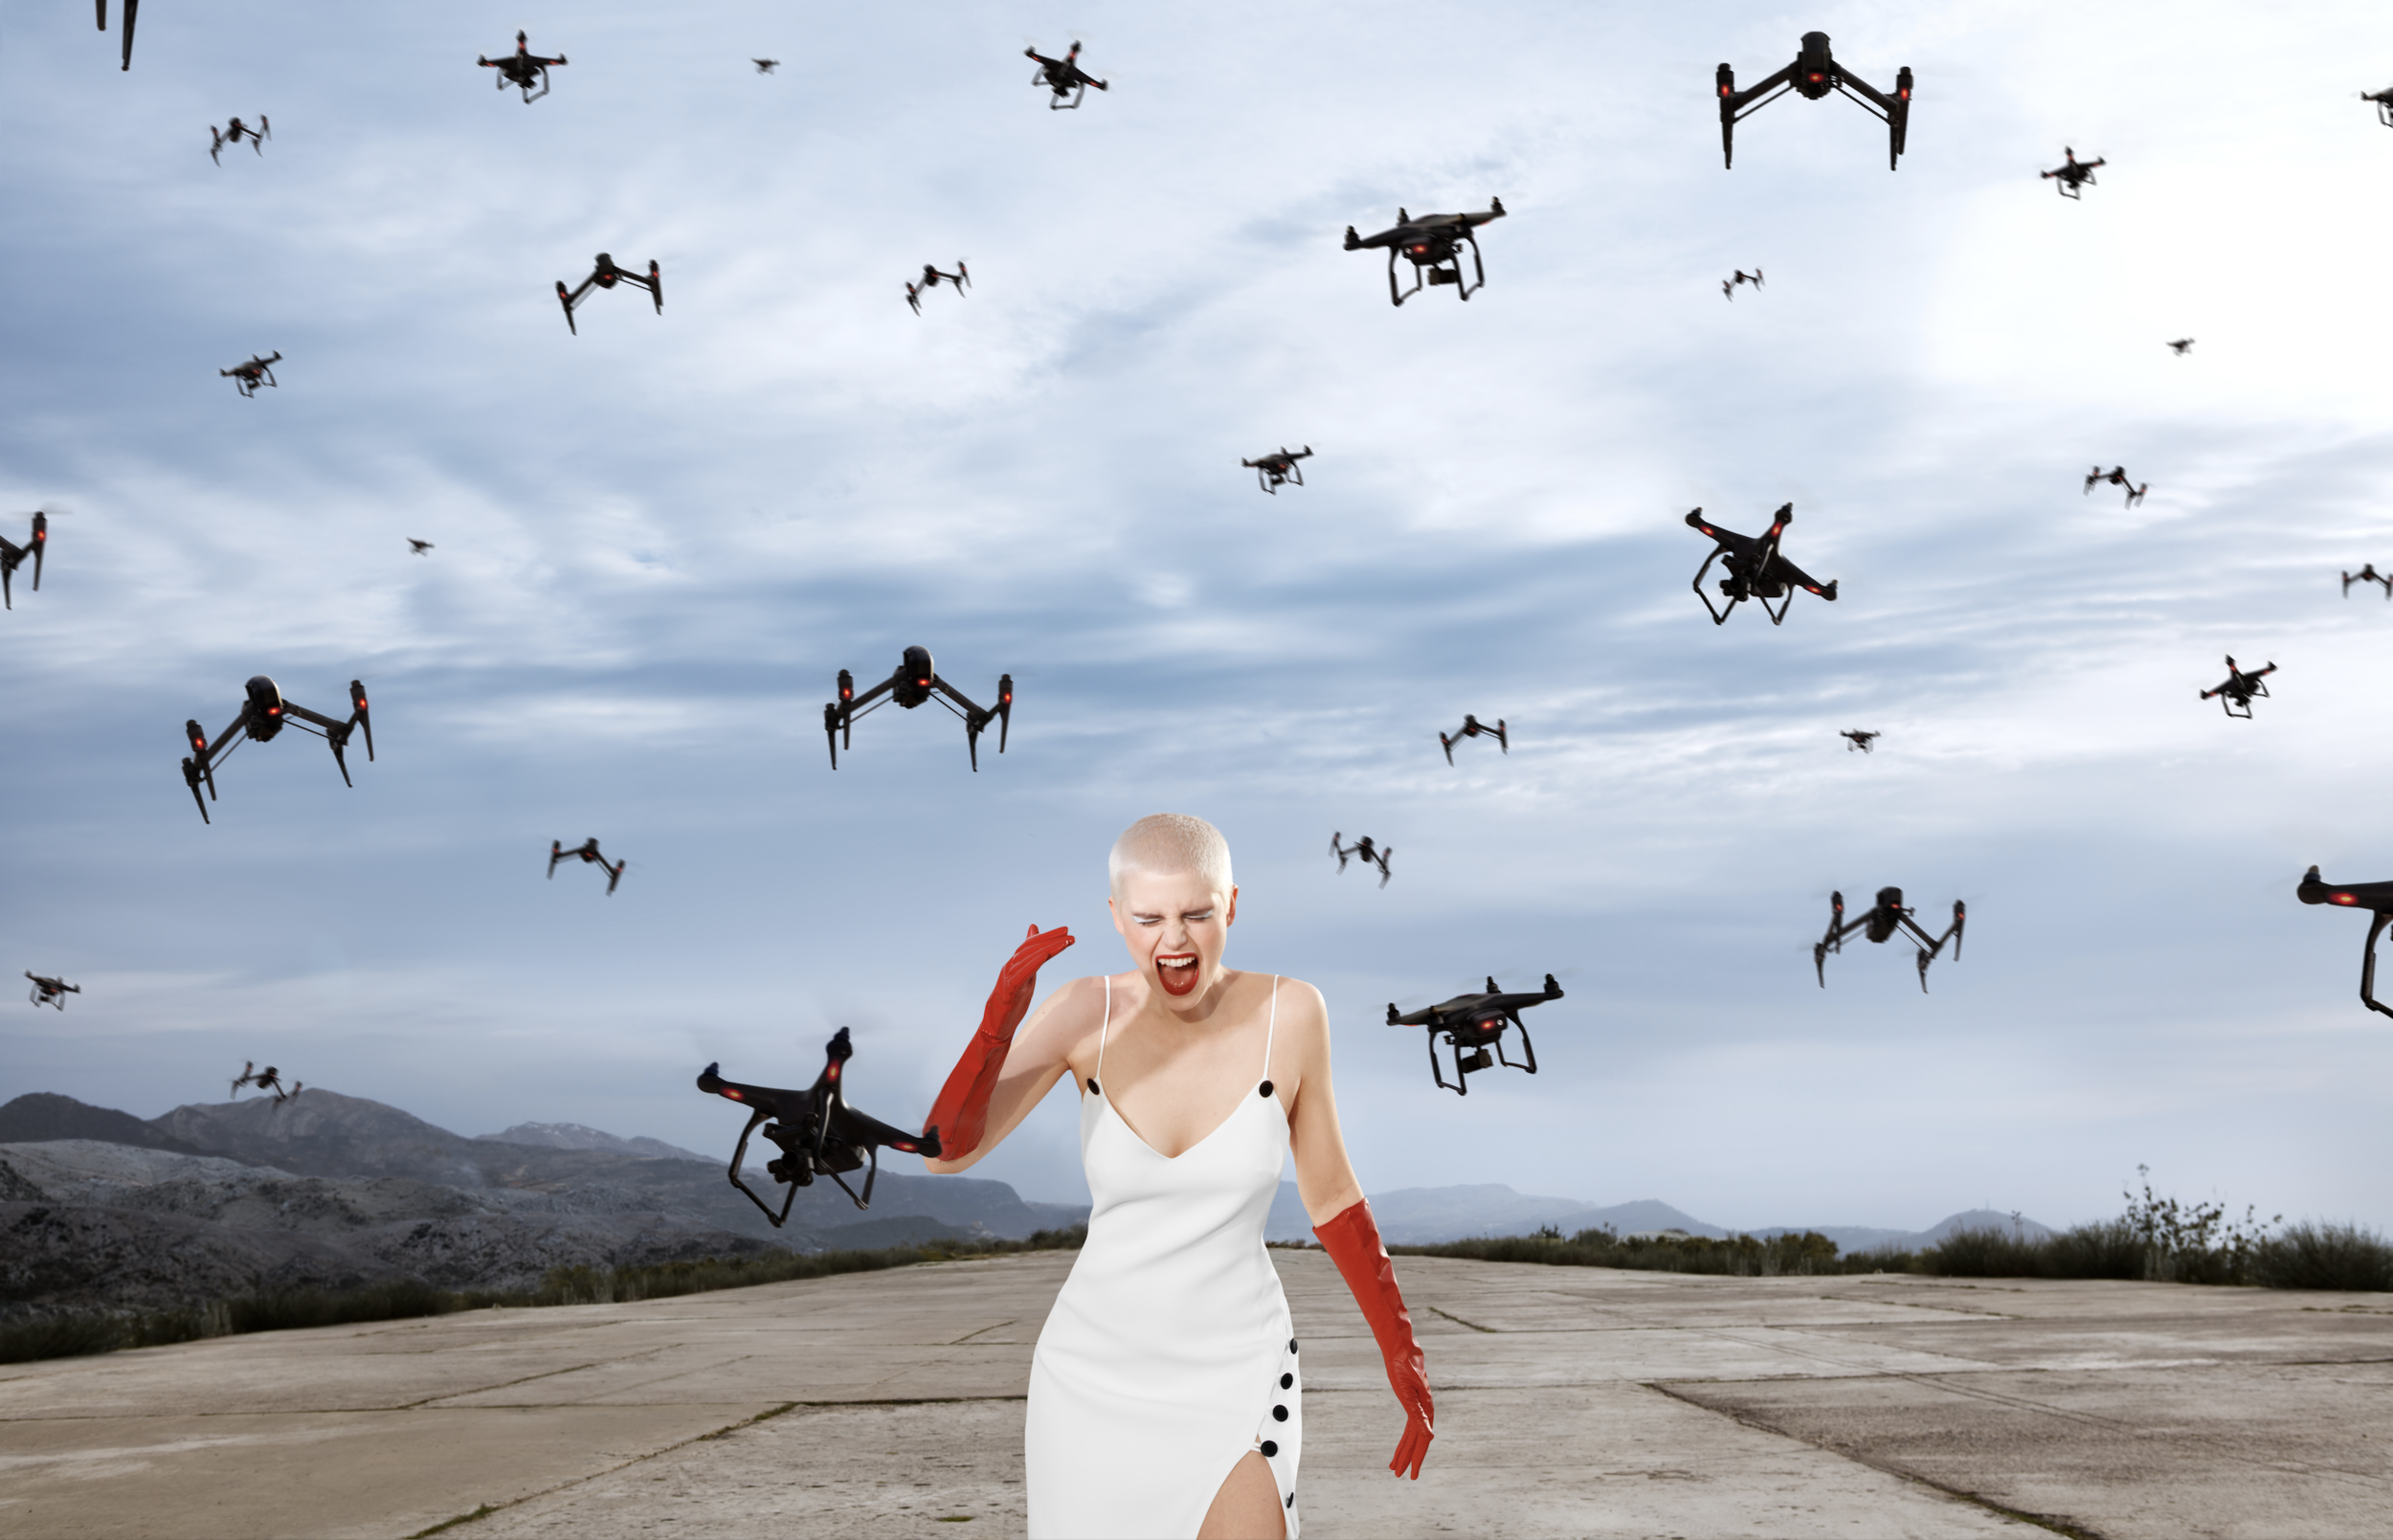 'The Drones' Editorial for Plastik Magazine